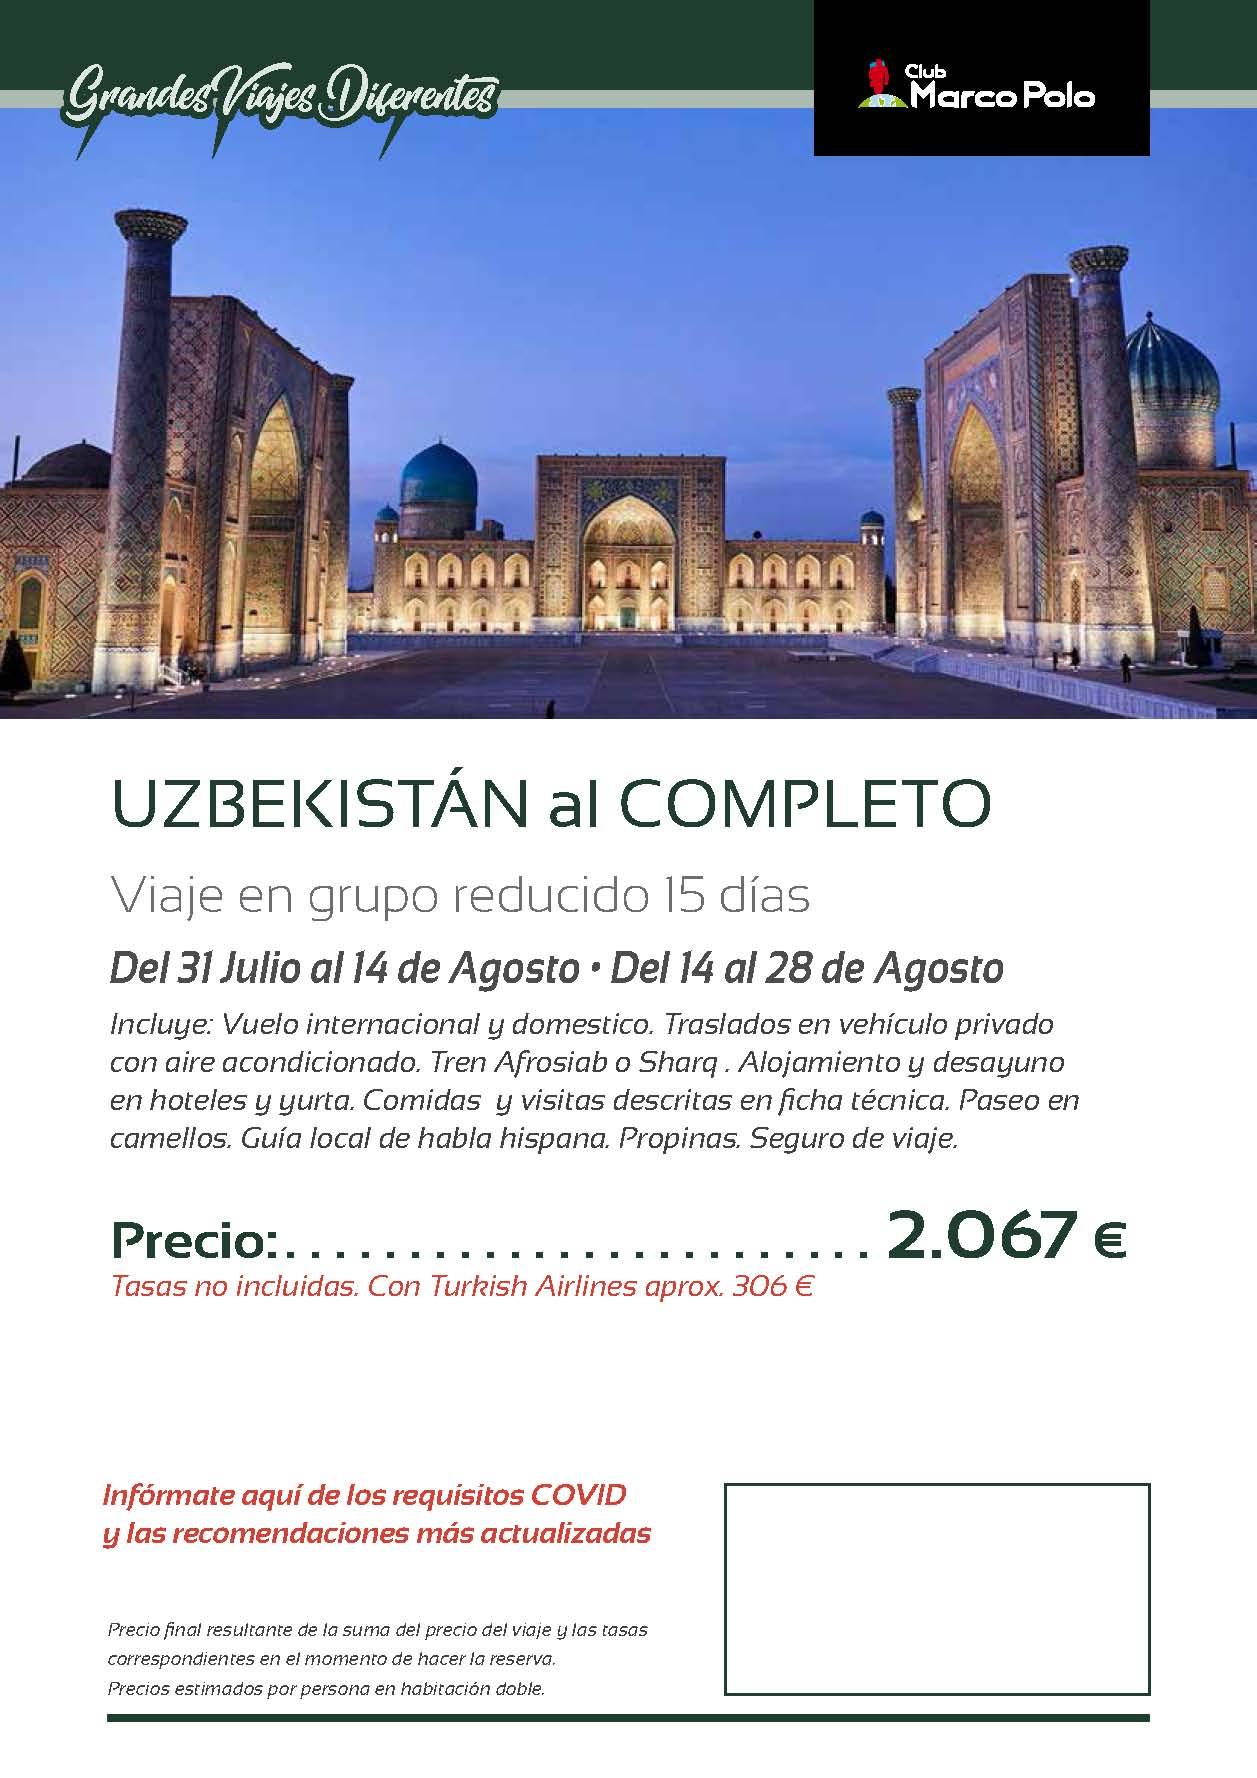 Oferta Club Marco Polo viaje a Uzbekistan Julio 2021